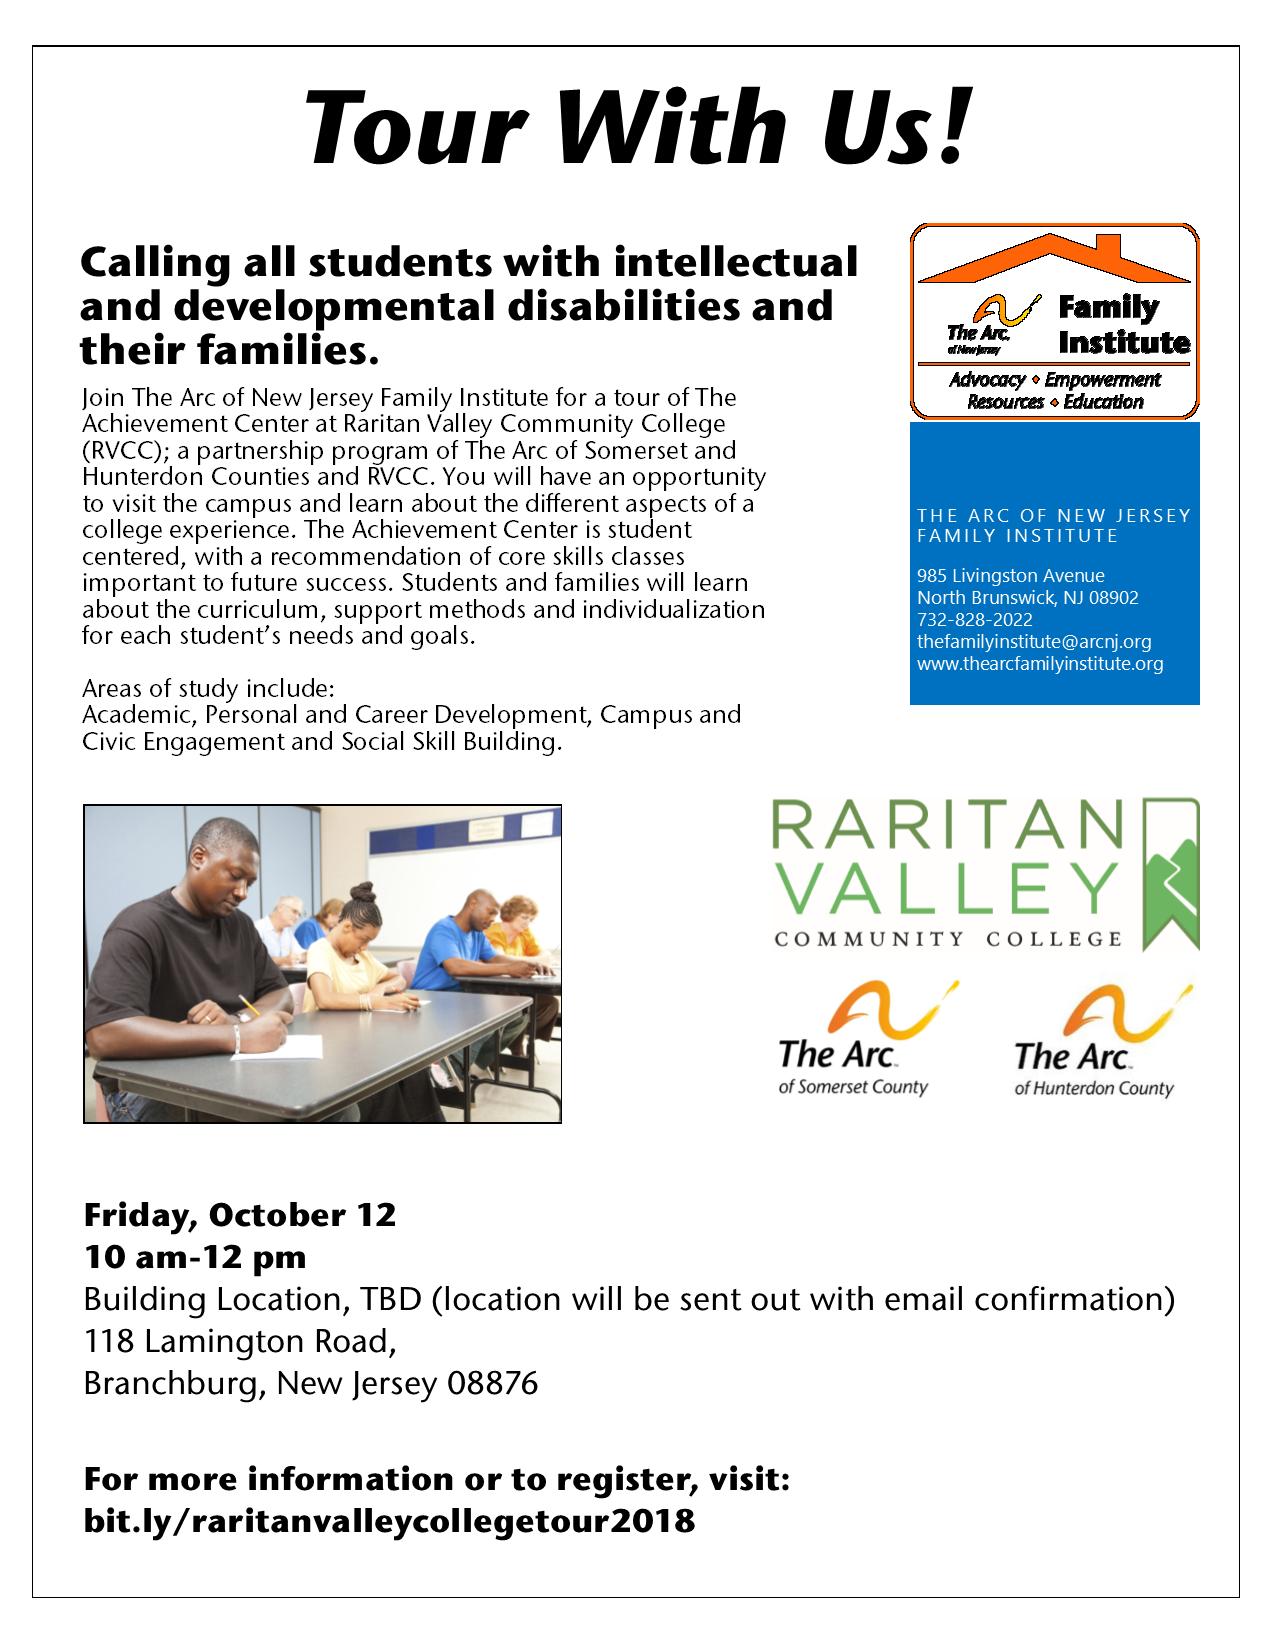 Raritan Valley Community College Tour